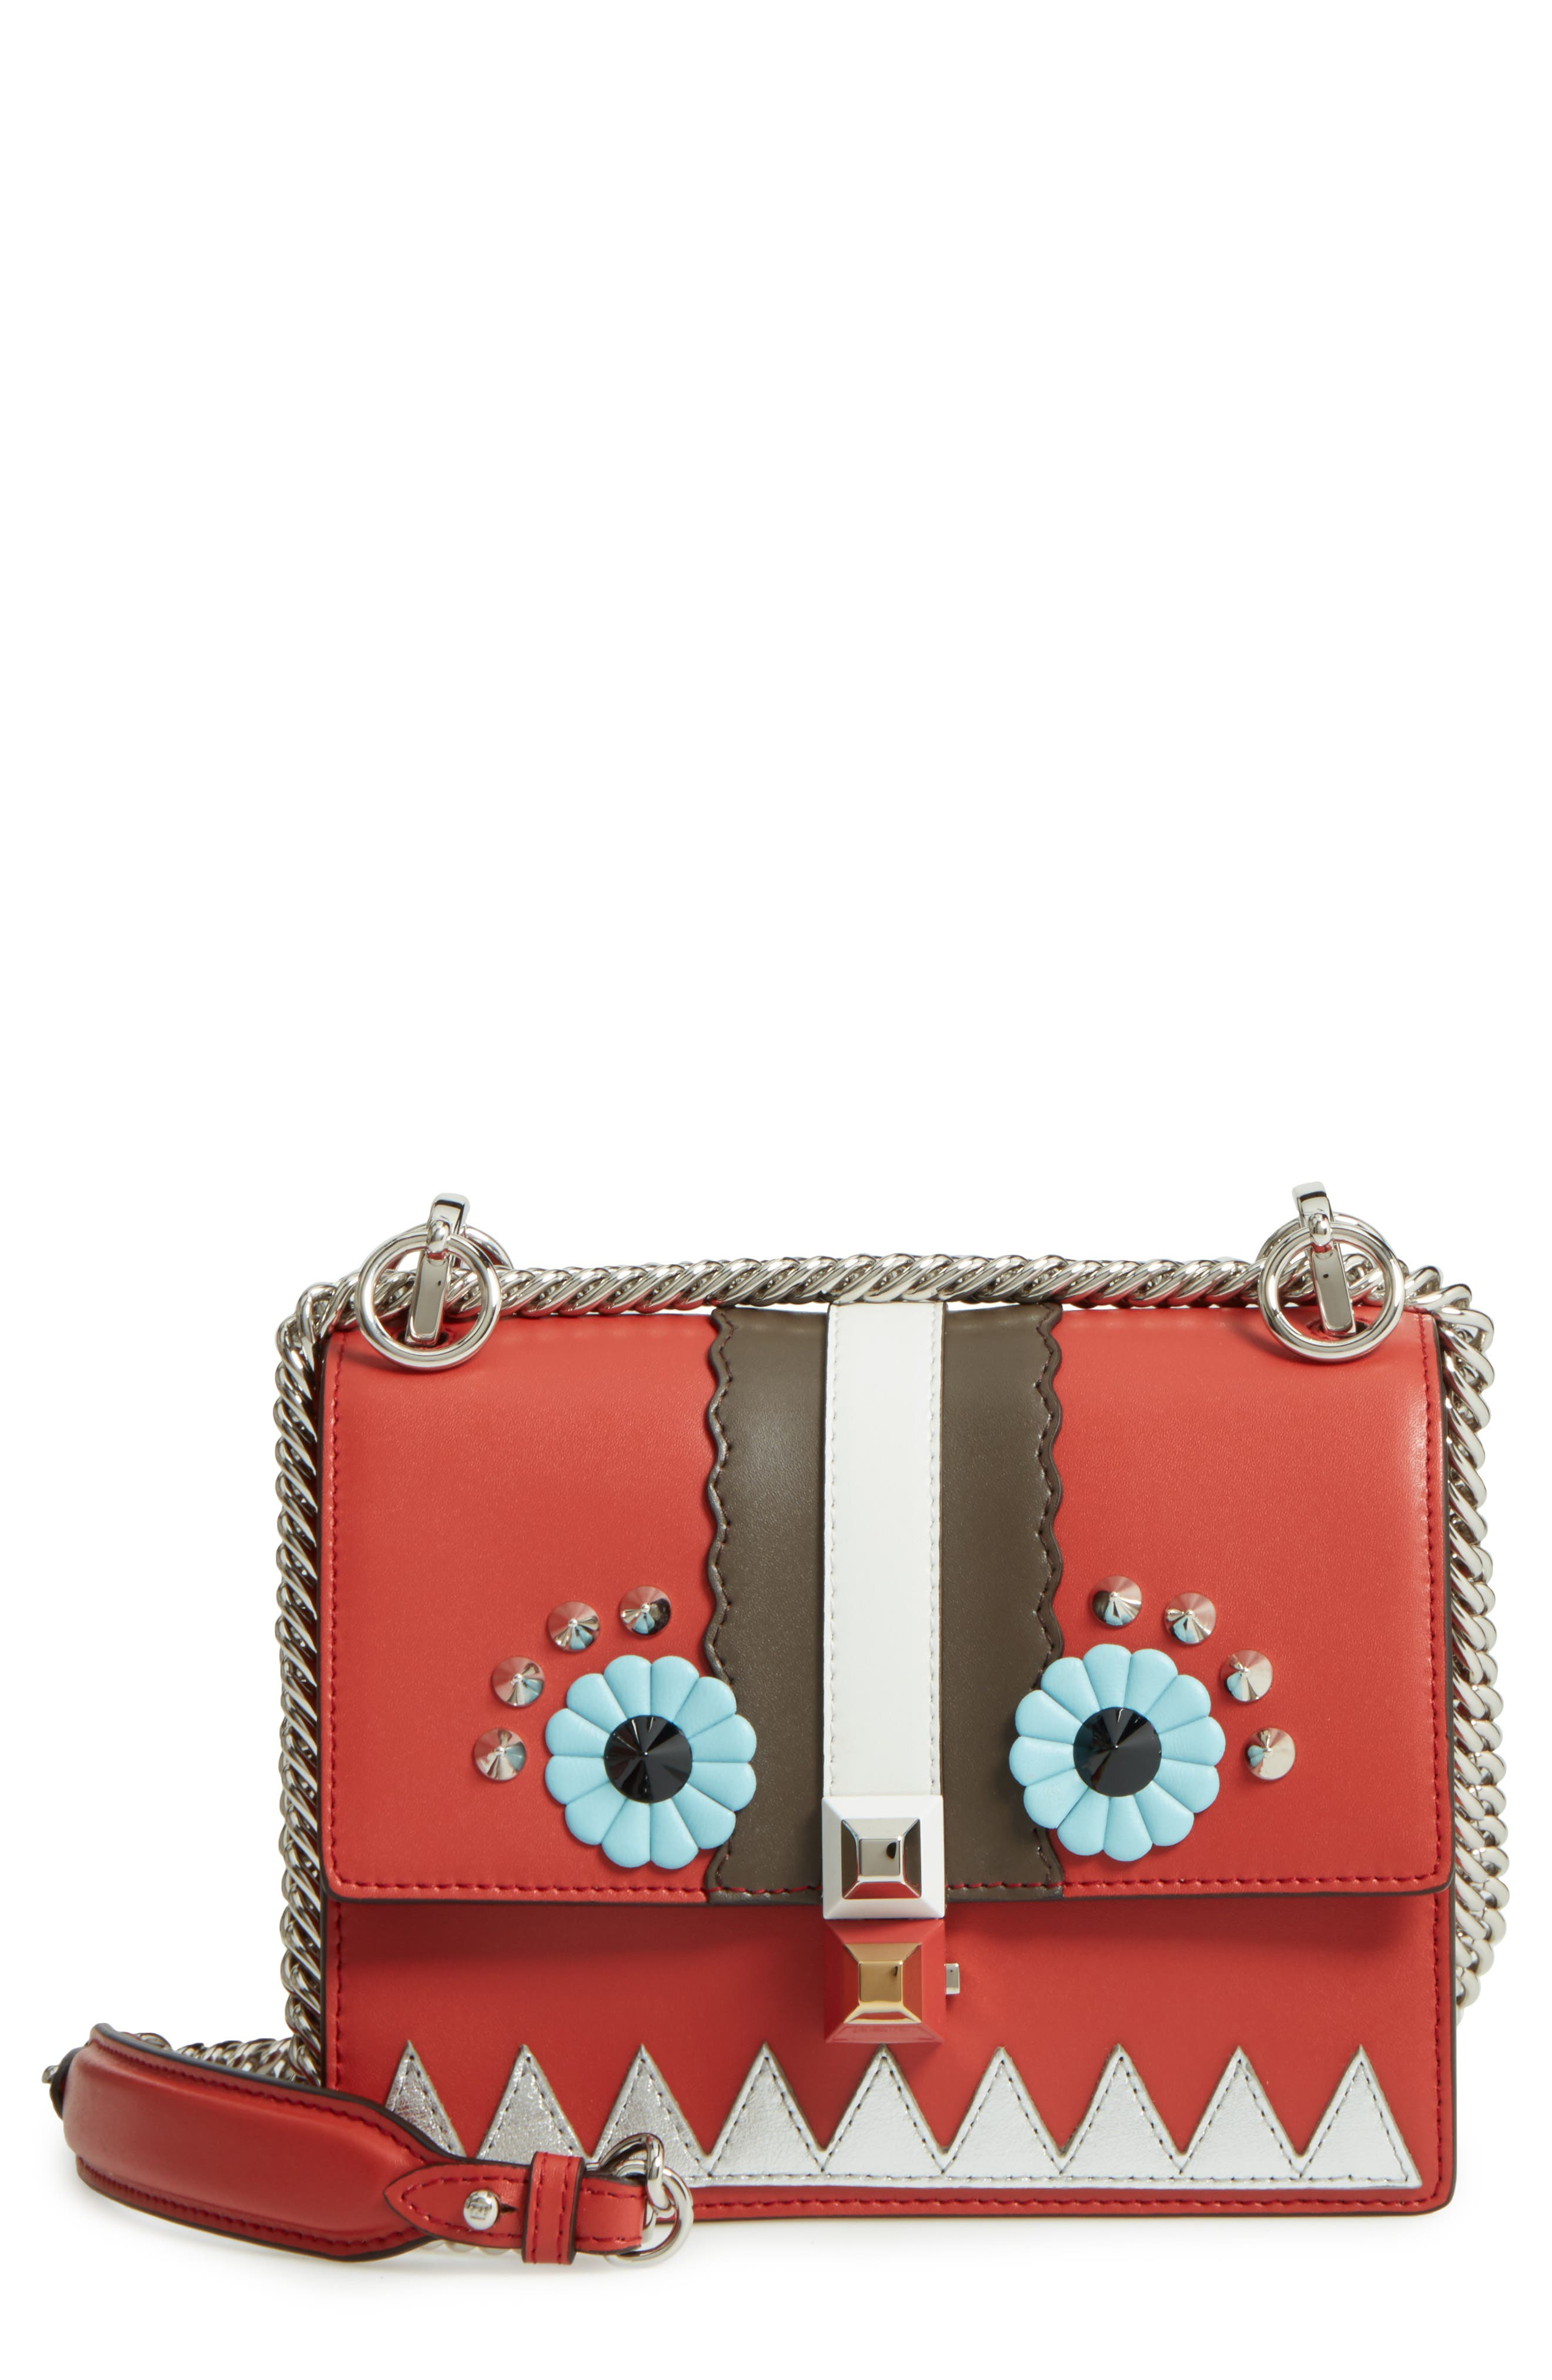 Fendi Mini Kan I Faces Leather Shoulder Bag